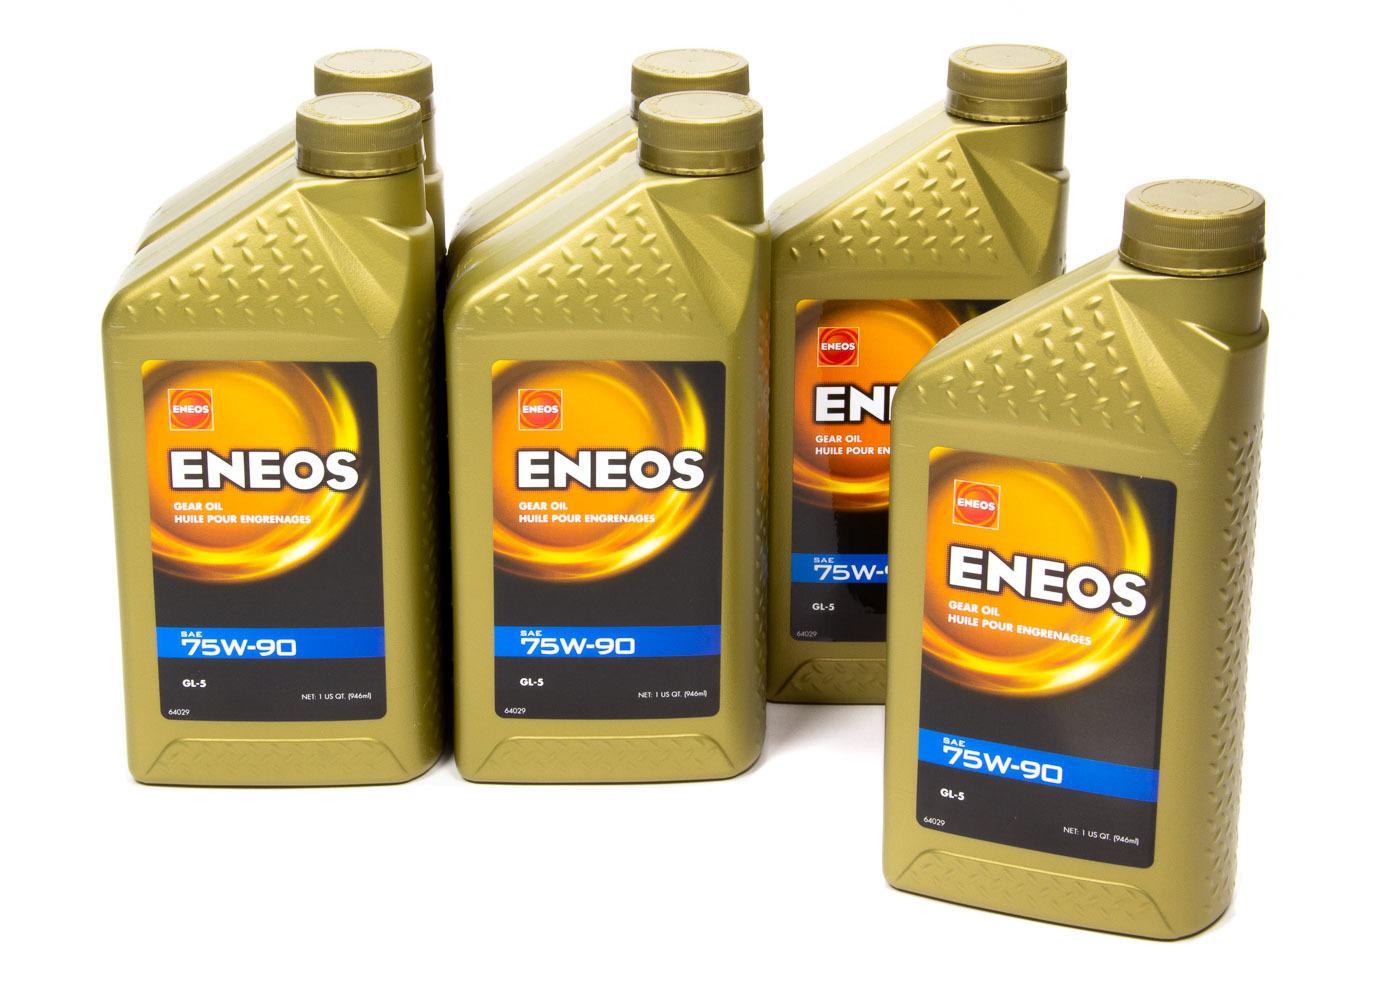 Eneos Gear Oil 75W90 6 X 1 Qt